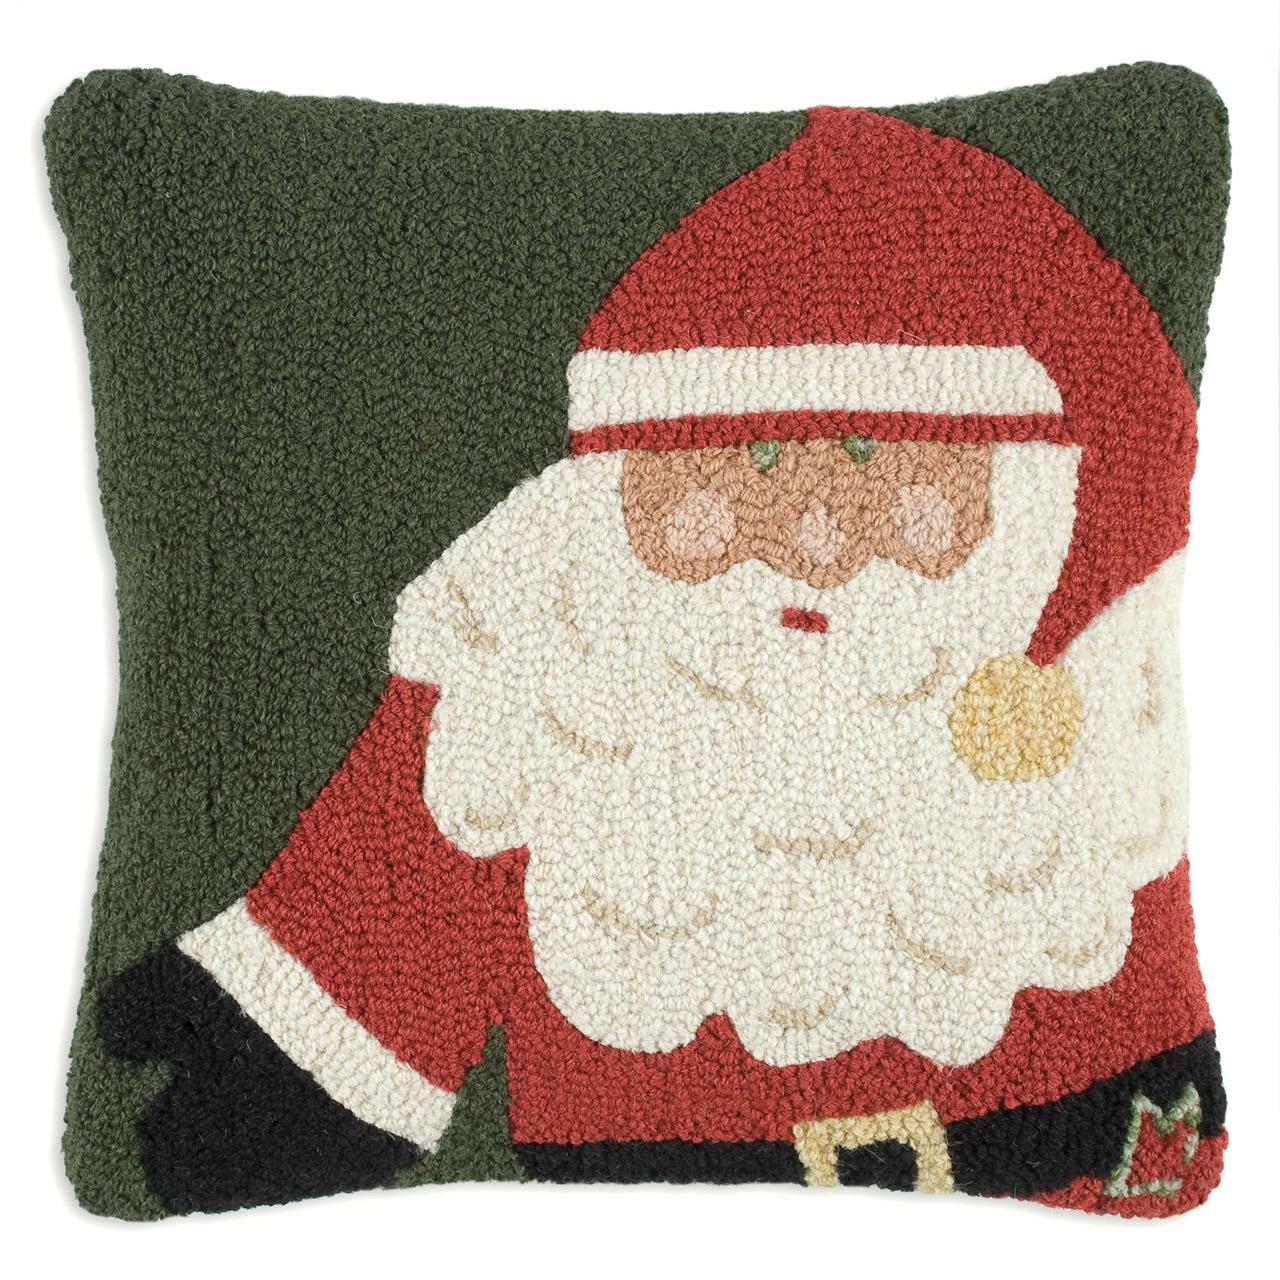 165NOEL papa noel pillow